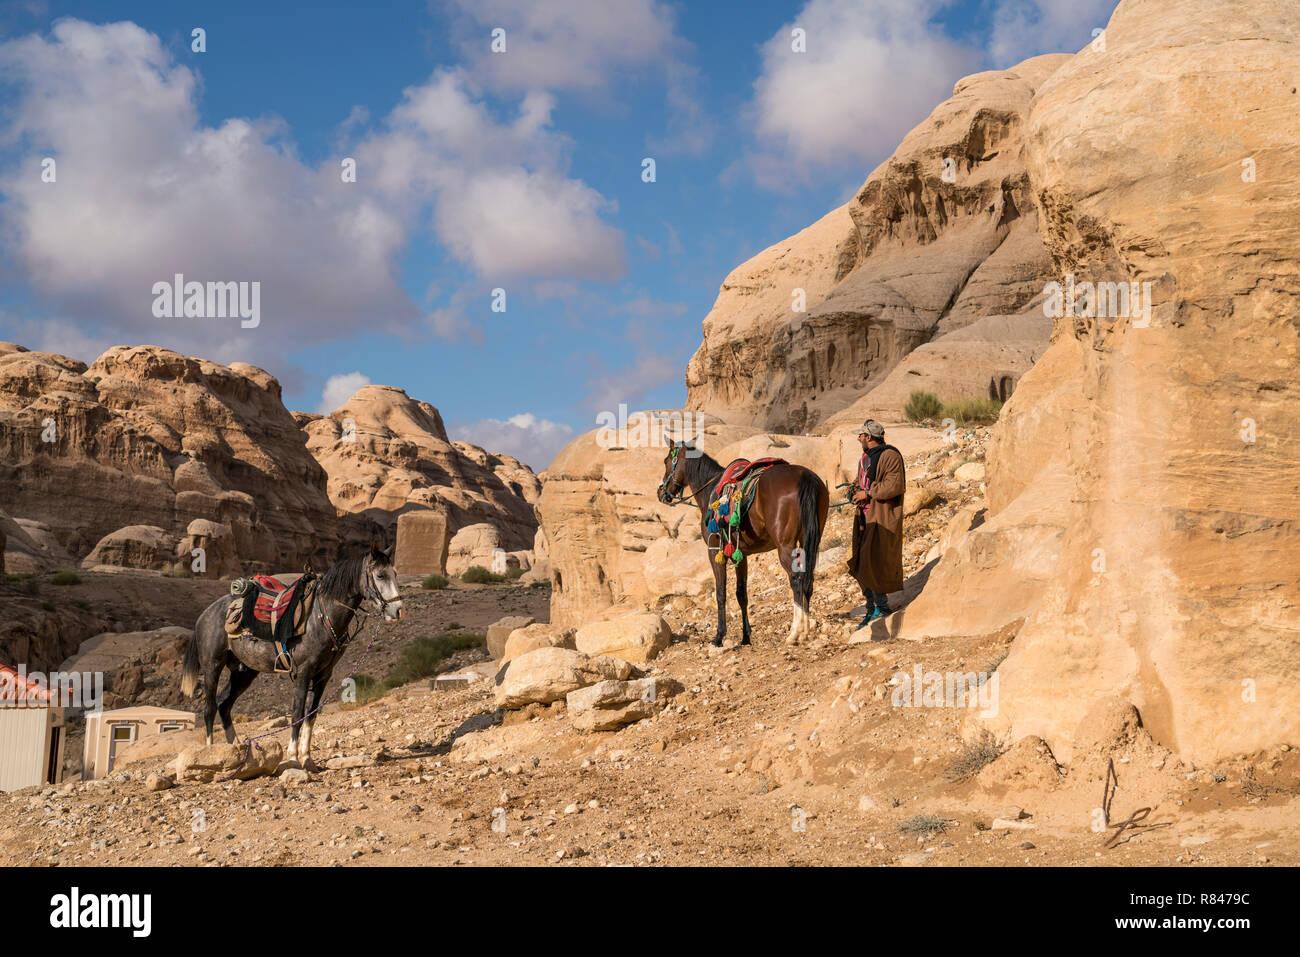 Pferde in der Landschaft bei der historischen Ruinenstätte Petra, Jordanien, Asien   horses in the landscape around the ancient city of Petra, Jordan, - Stock Image